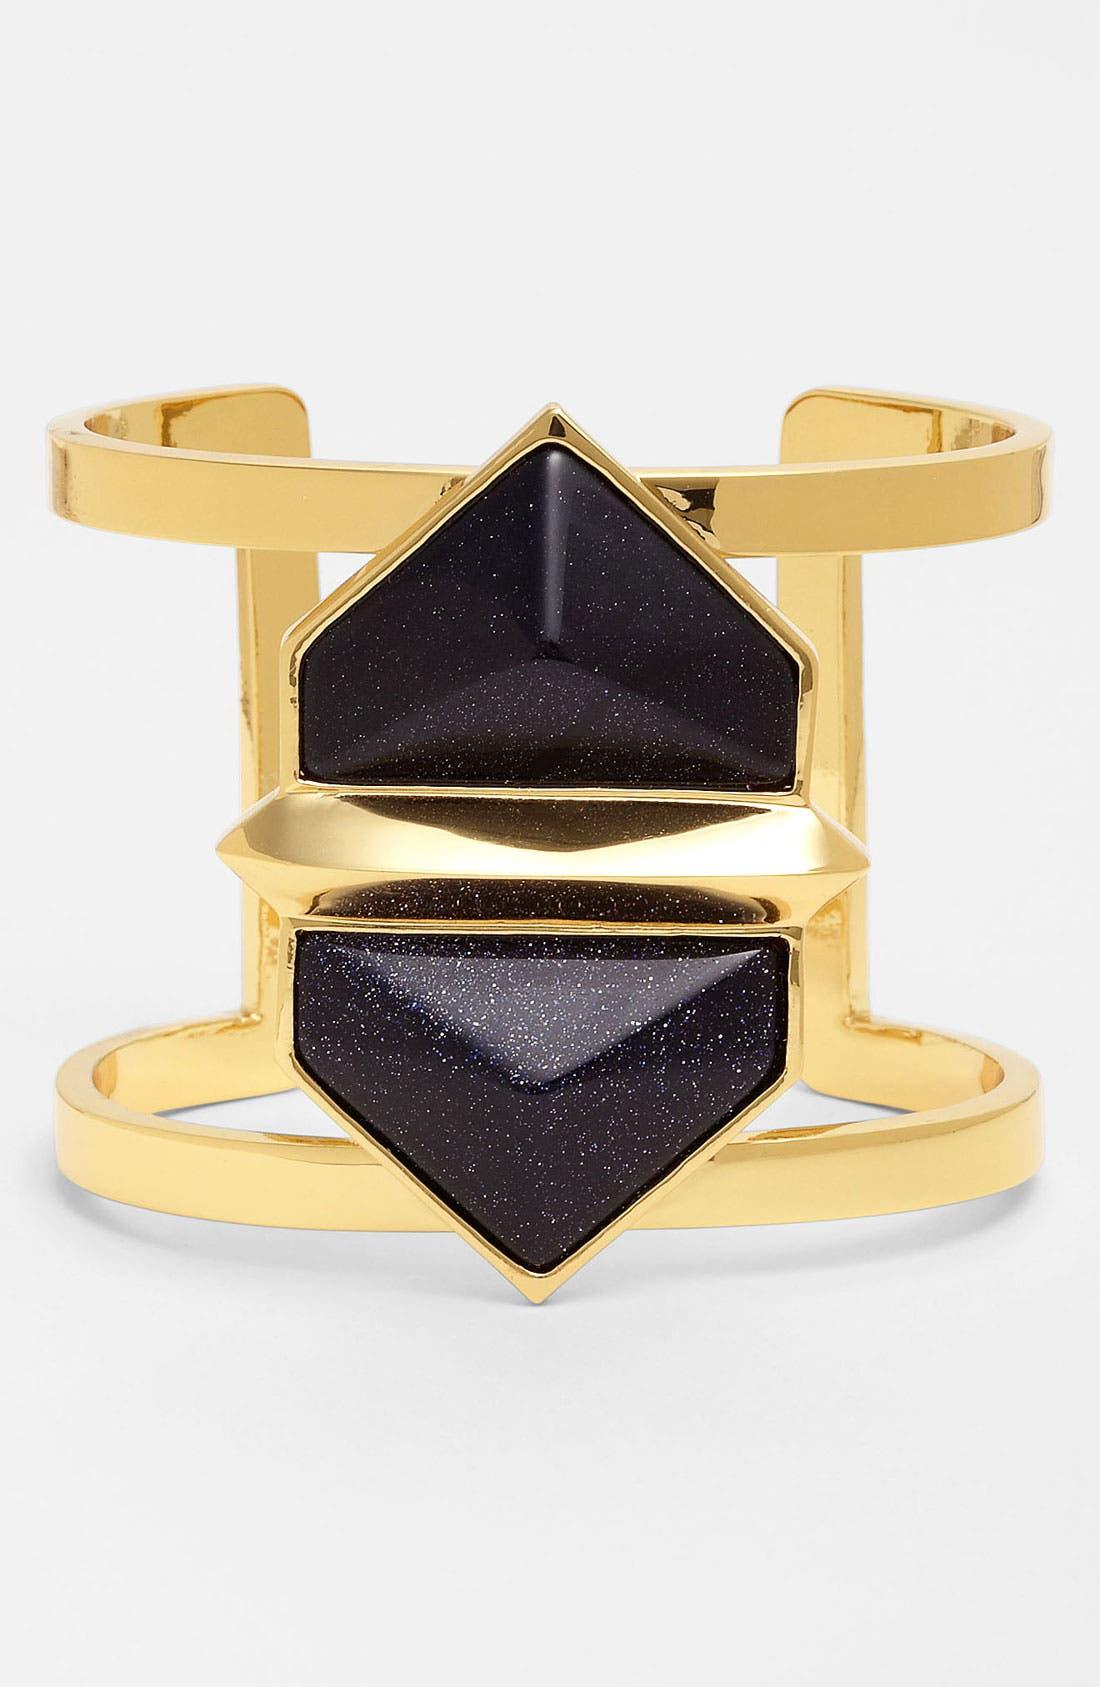 Main Image - Vince Camuto 'Hidden Gems' Cuff